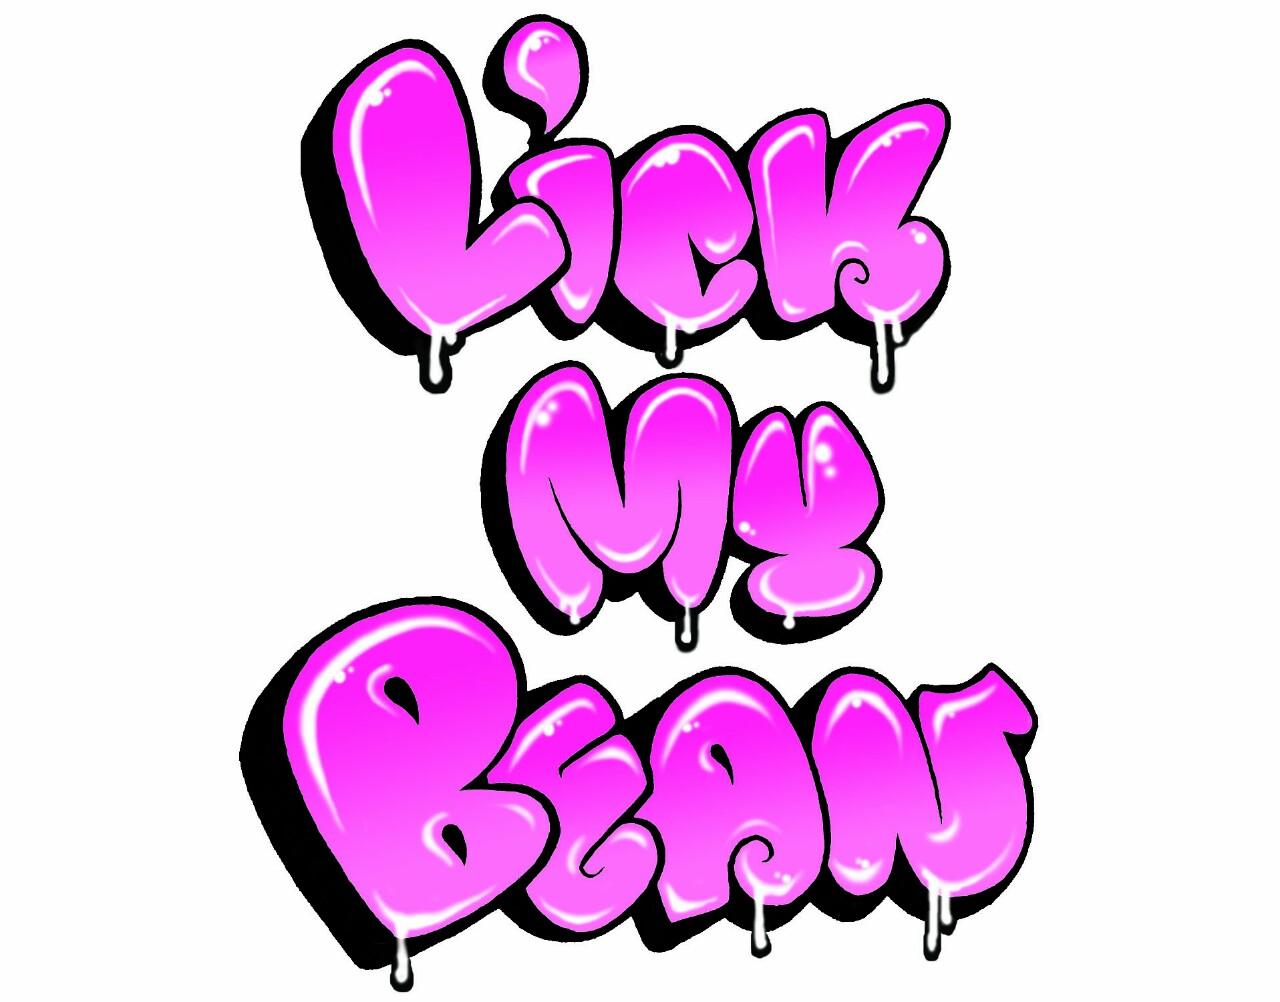 Lick the bean